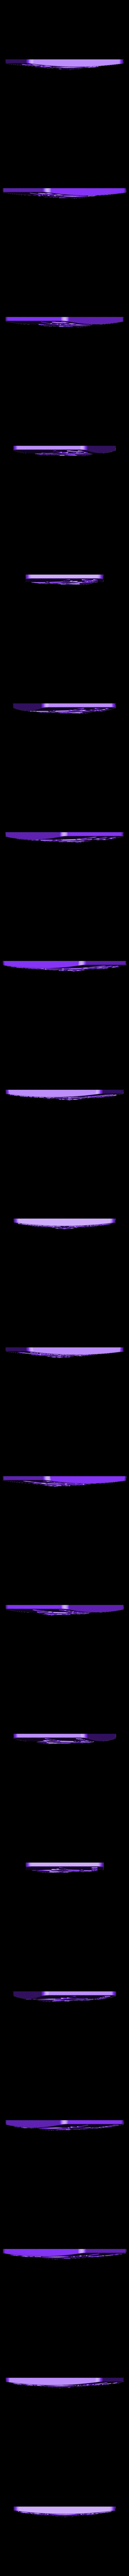 vdv.stl Download free STL file Солдатские бляхи на 23 февраля (belt buckle) • Model to 3D print, shuranikishin